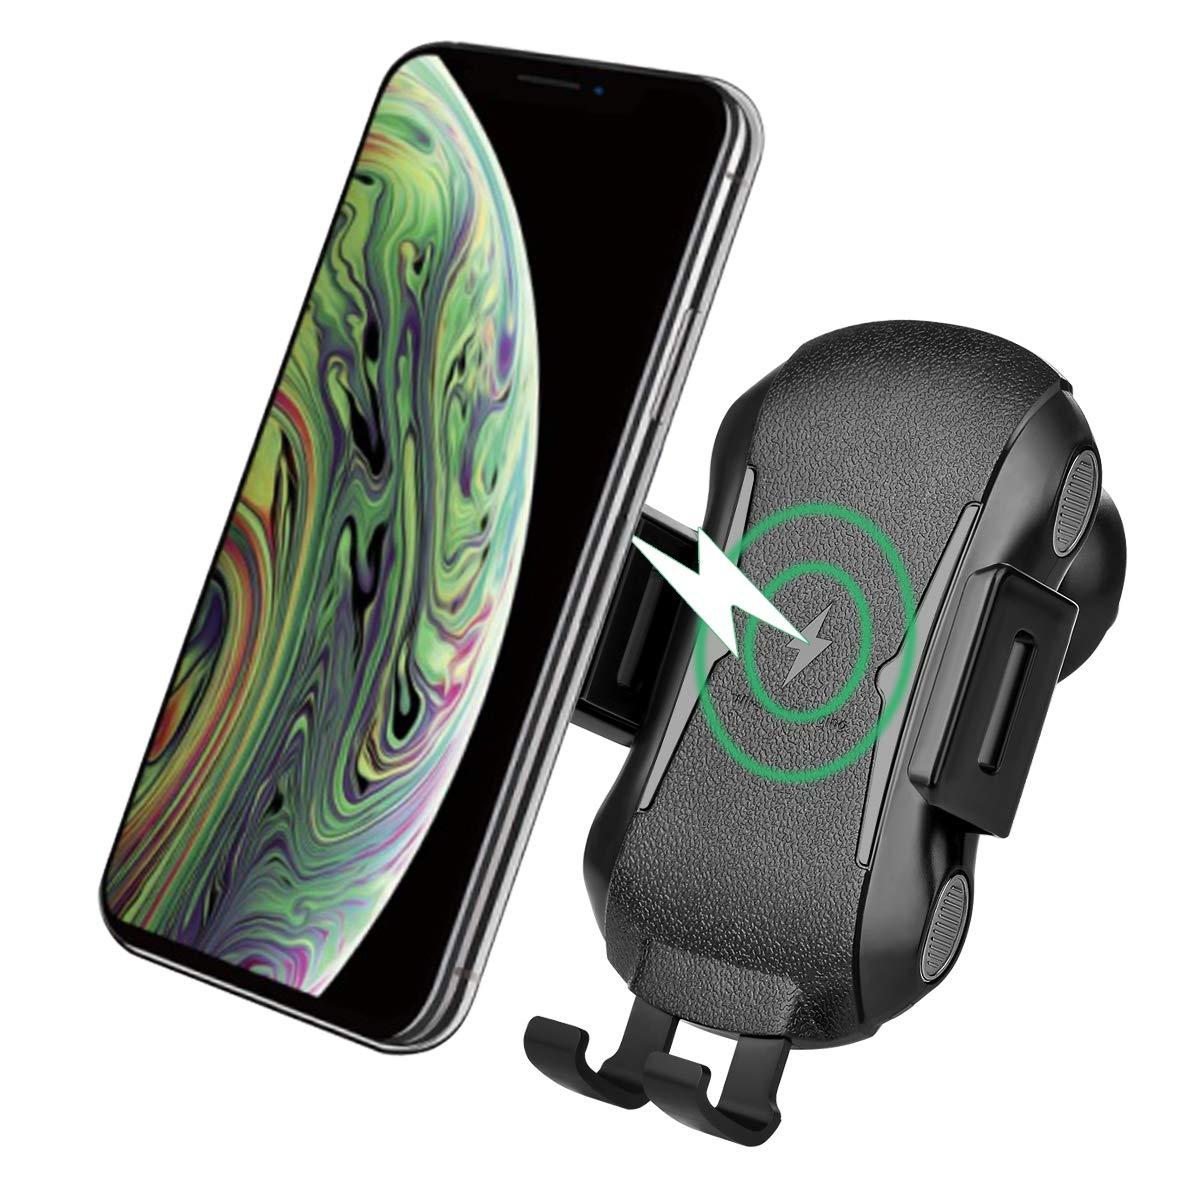 Samsung Galaxy s10// s9// s8// S7 10W Qi Cargador Wireless Carga R/ápida Coche Soporte M/óvil Aplicable a Rejillas del Aire para iPhone 8// X//XS//XS MAX//XR XLTOK Cargador Inal/ámbrico Coche